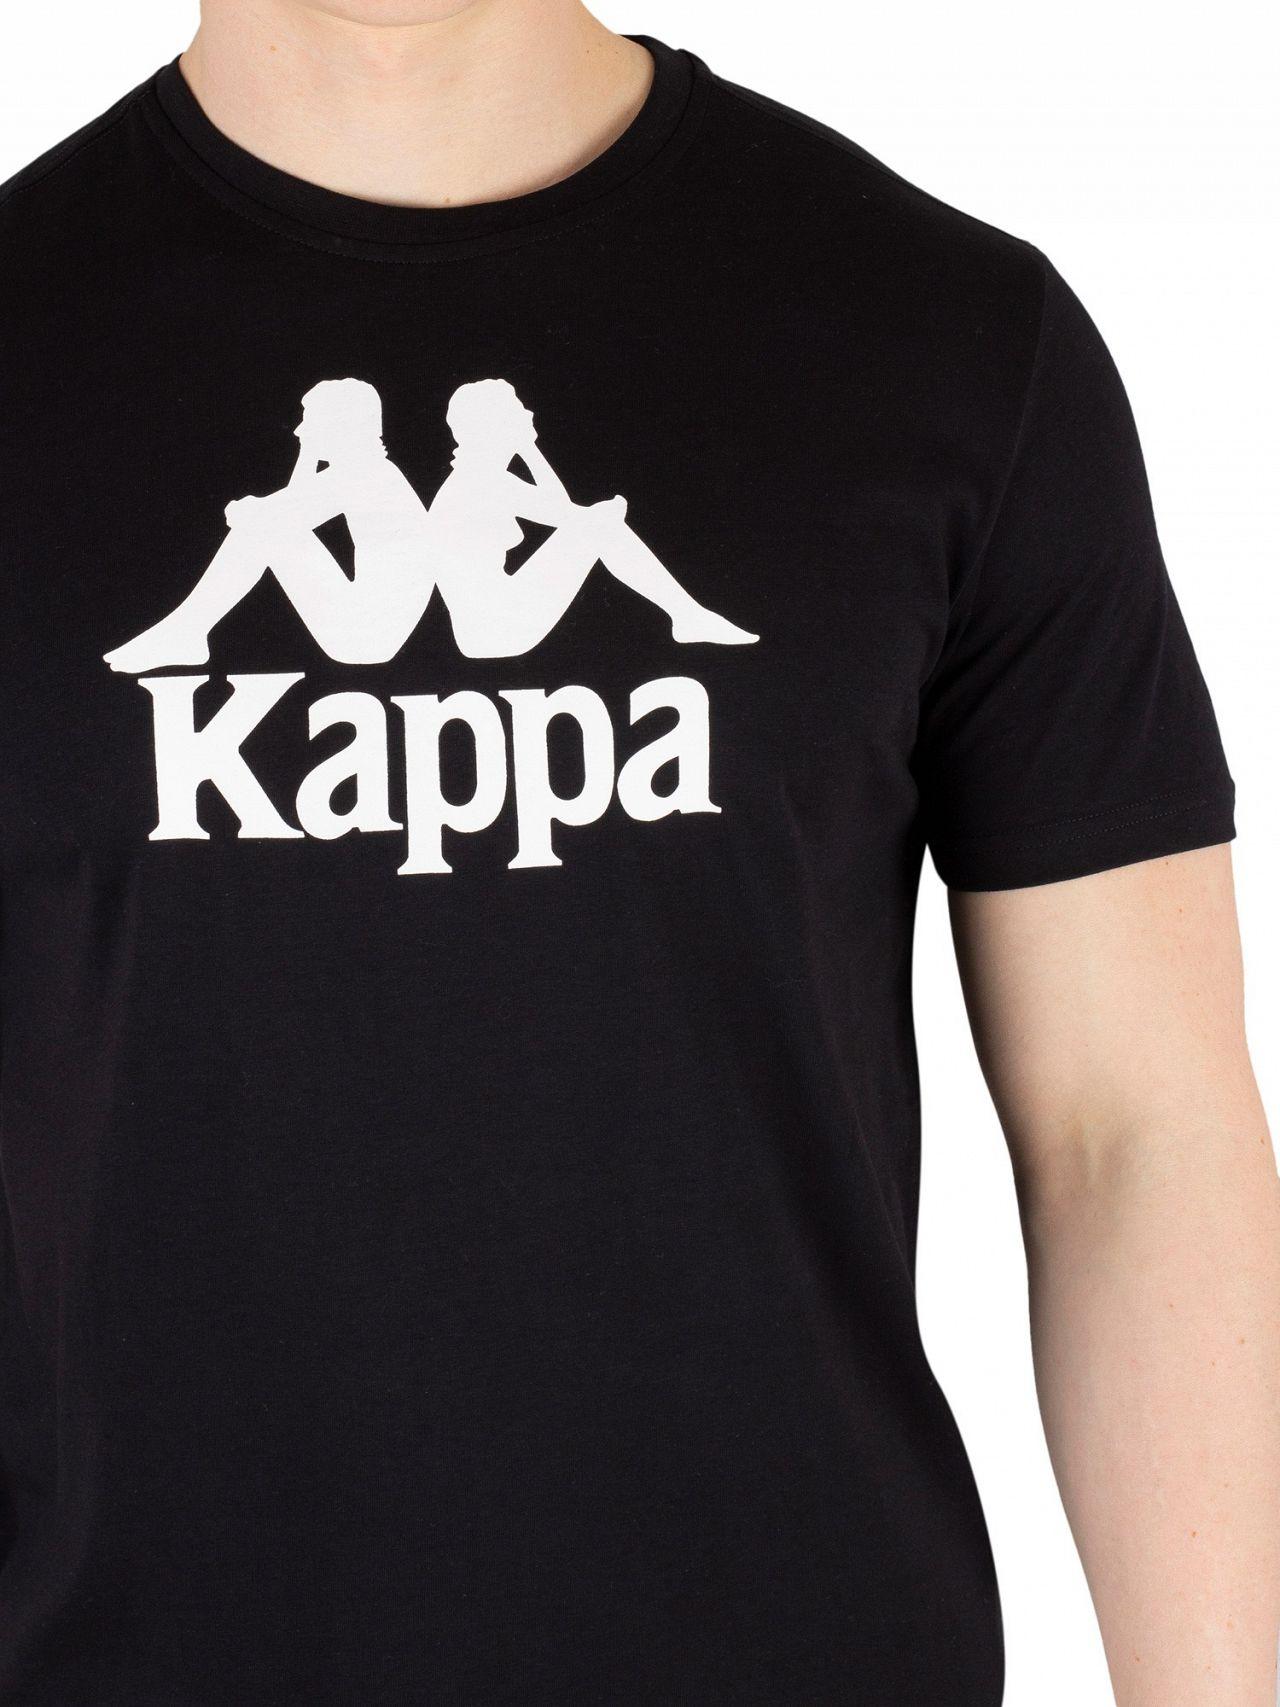 c31190ae5f Kappa Black Authentic Estessi T-Shirt